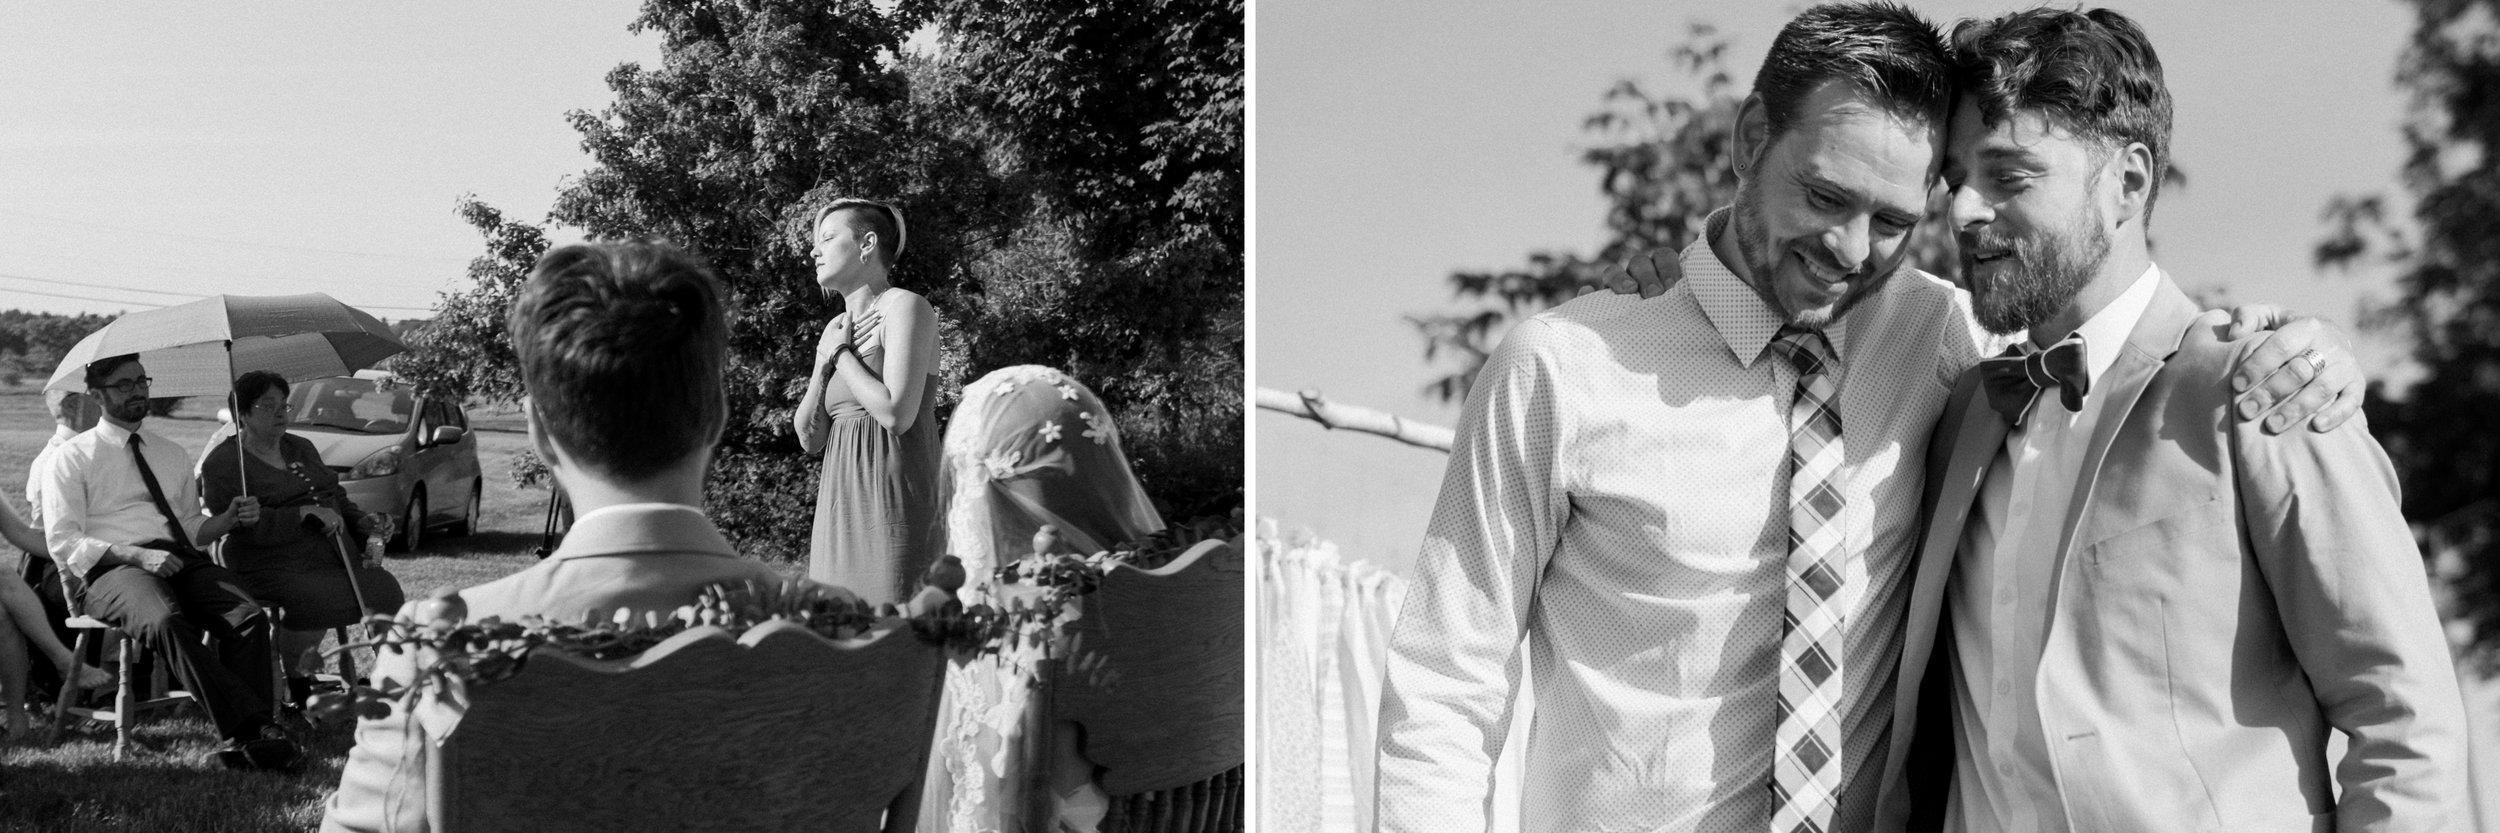 Le Vignoble de la Bauge wedding_013.JPG